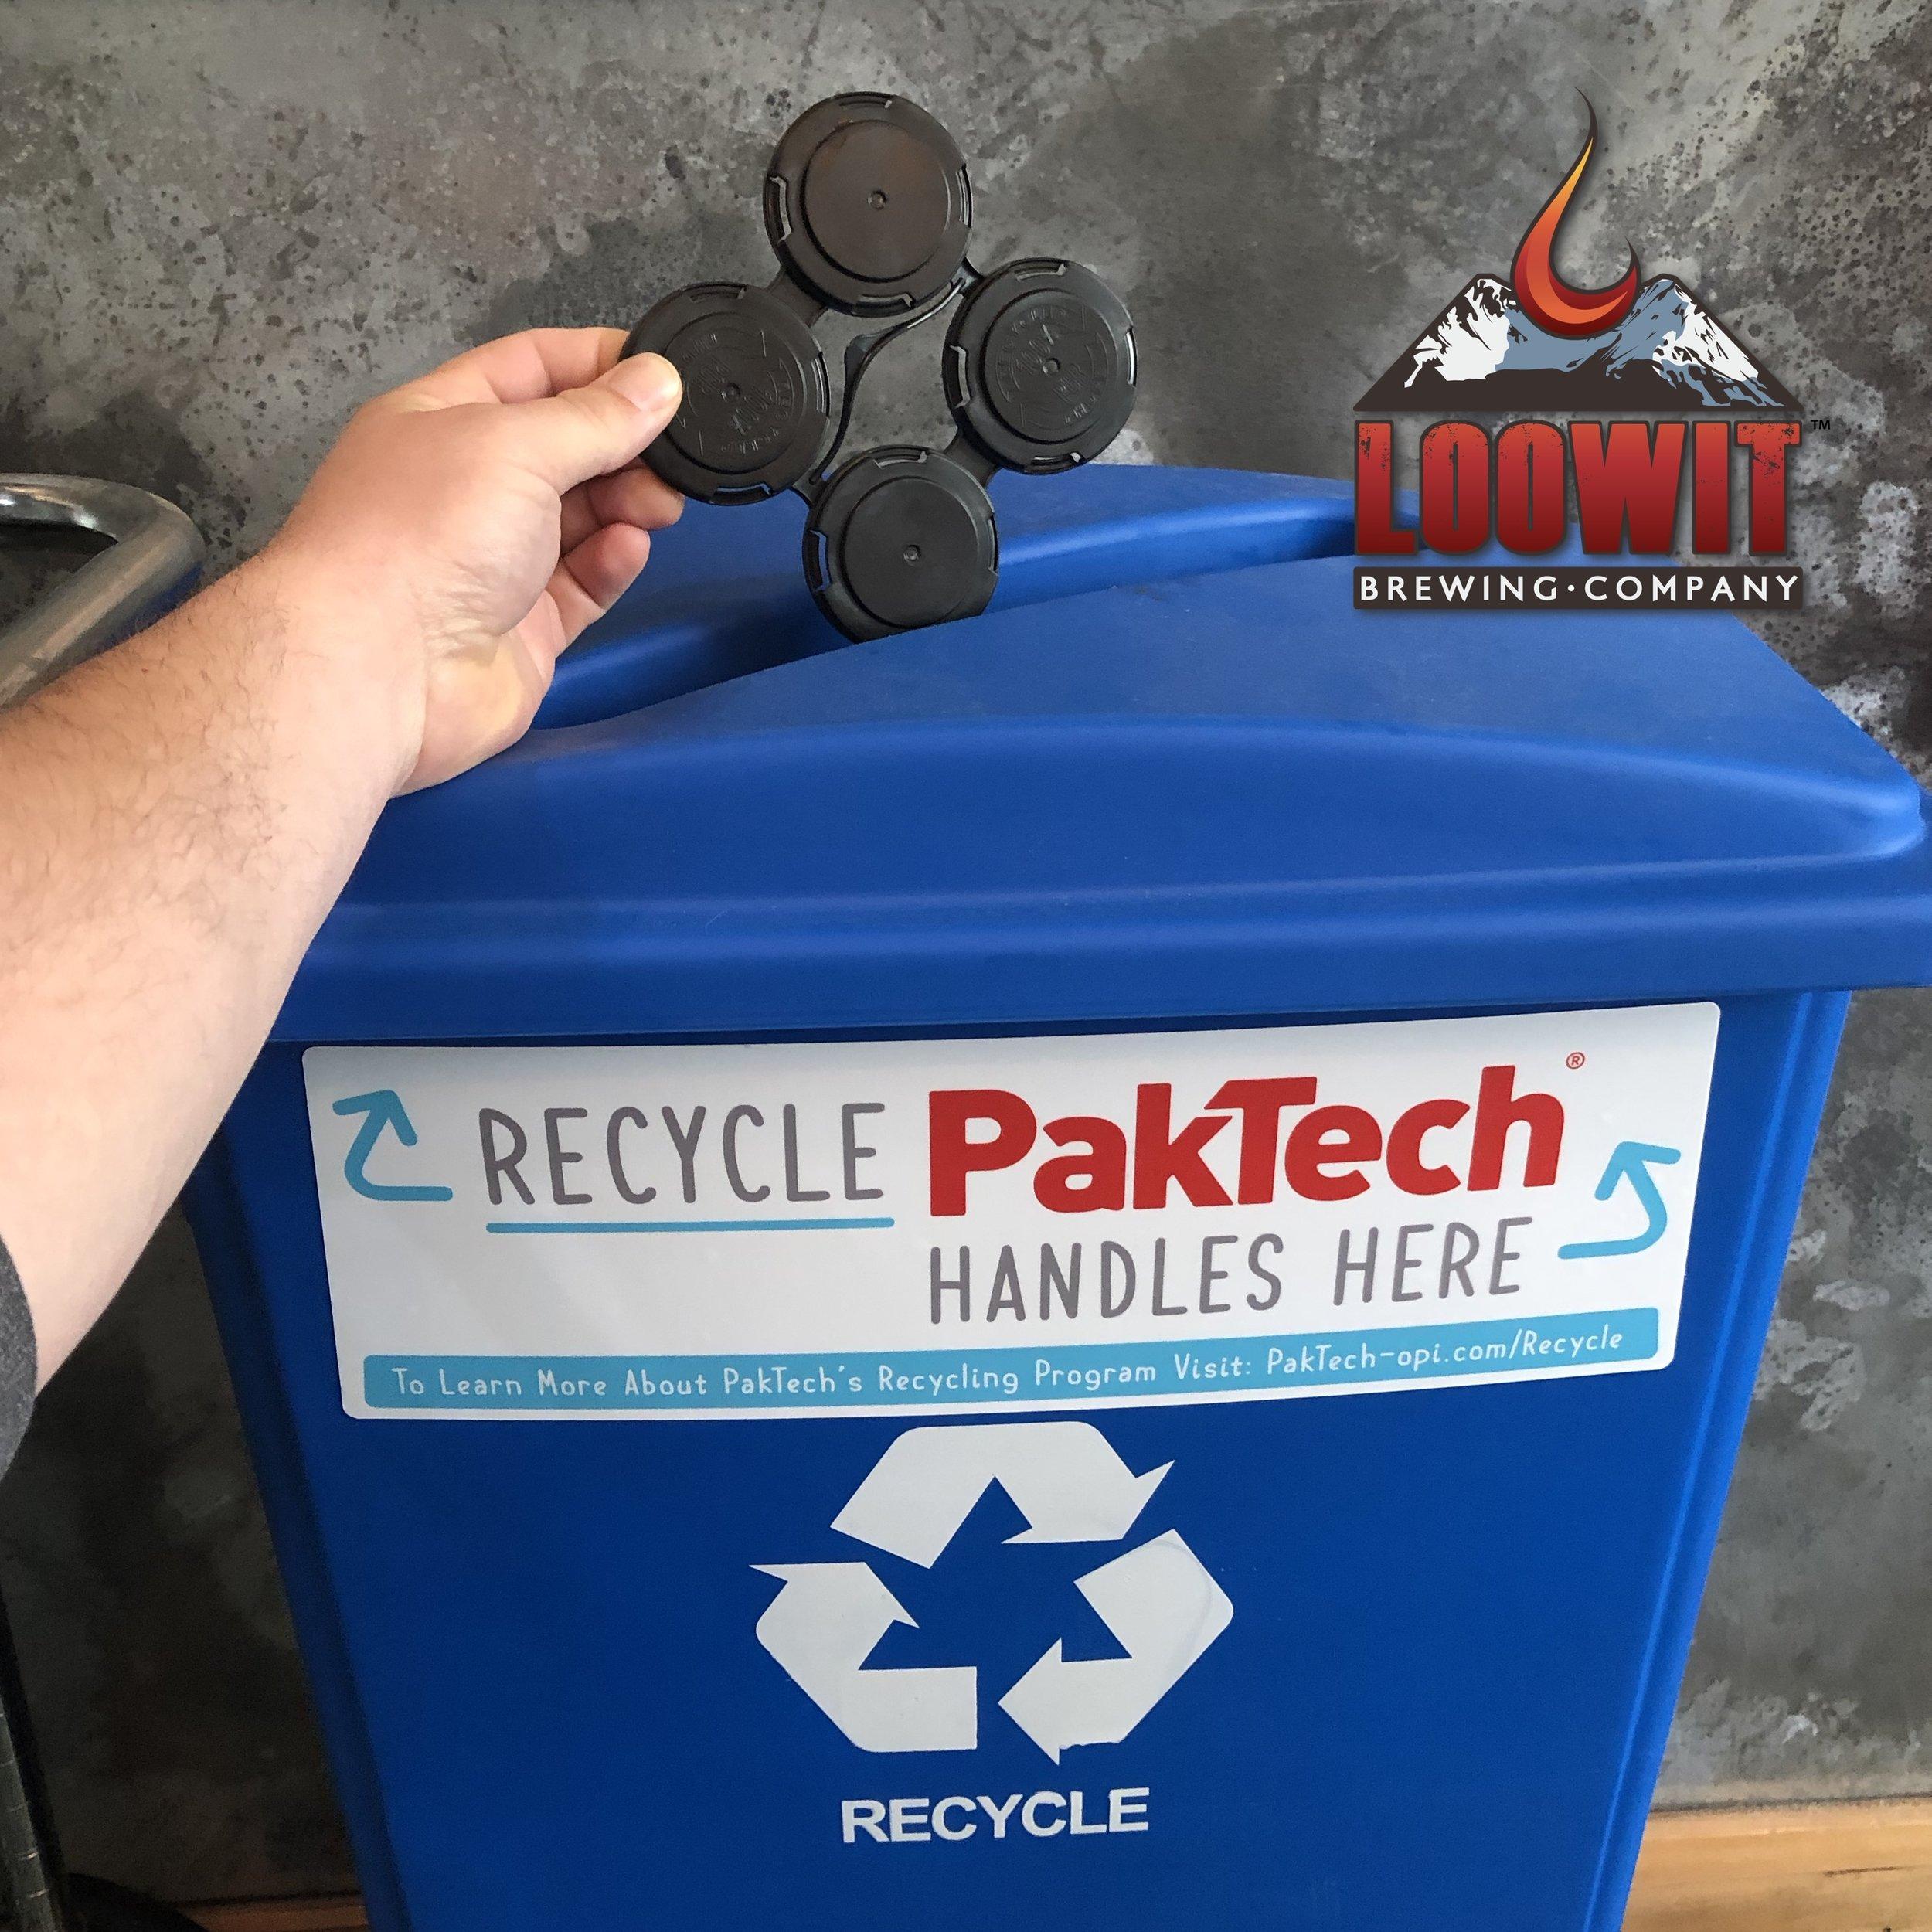 paktech-recycle.jpg